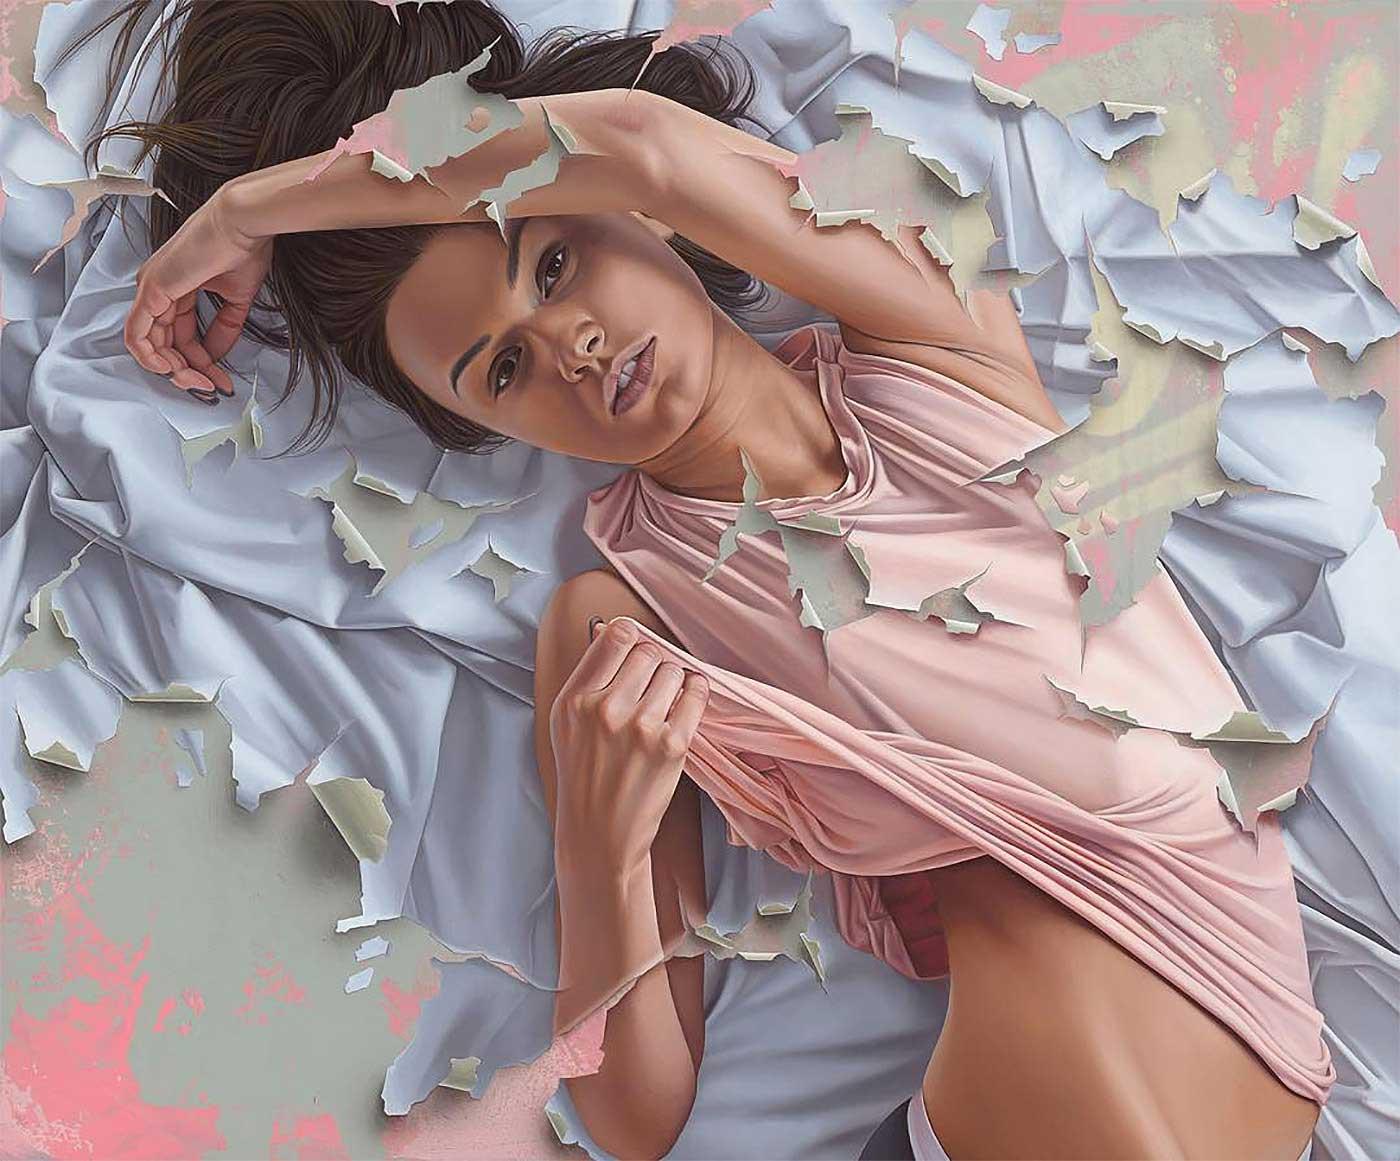 Abgeblätterte Gemälde von James Bullough James-Bullough-2020_06